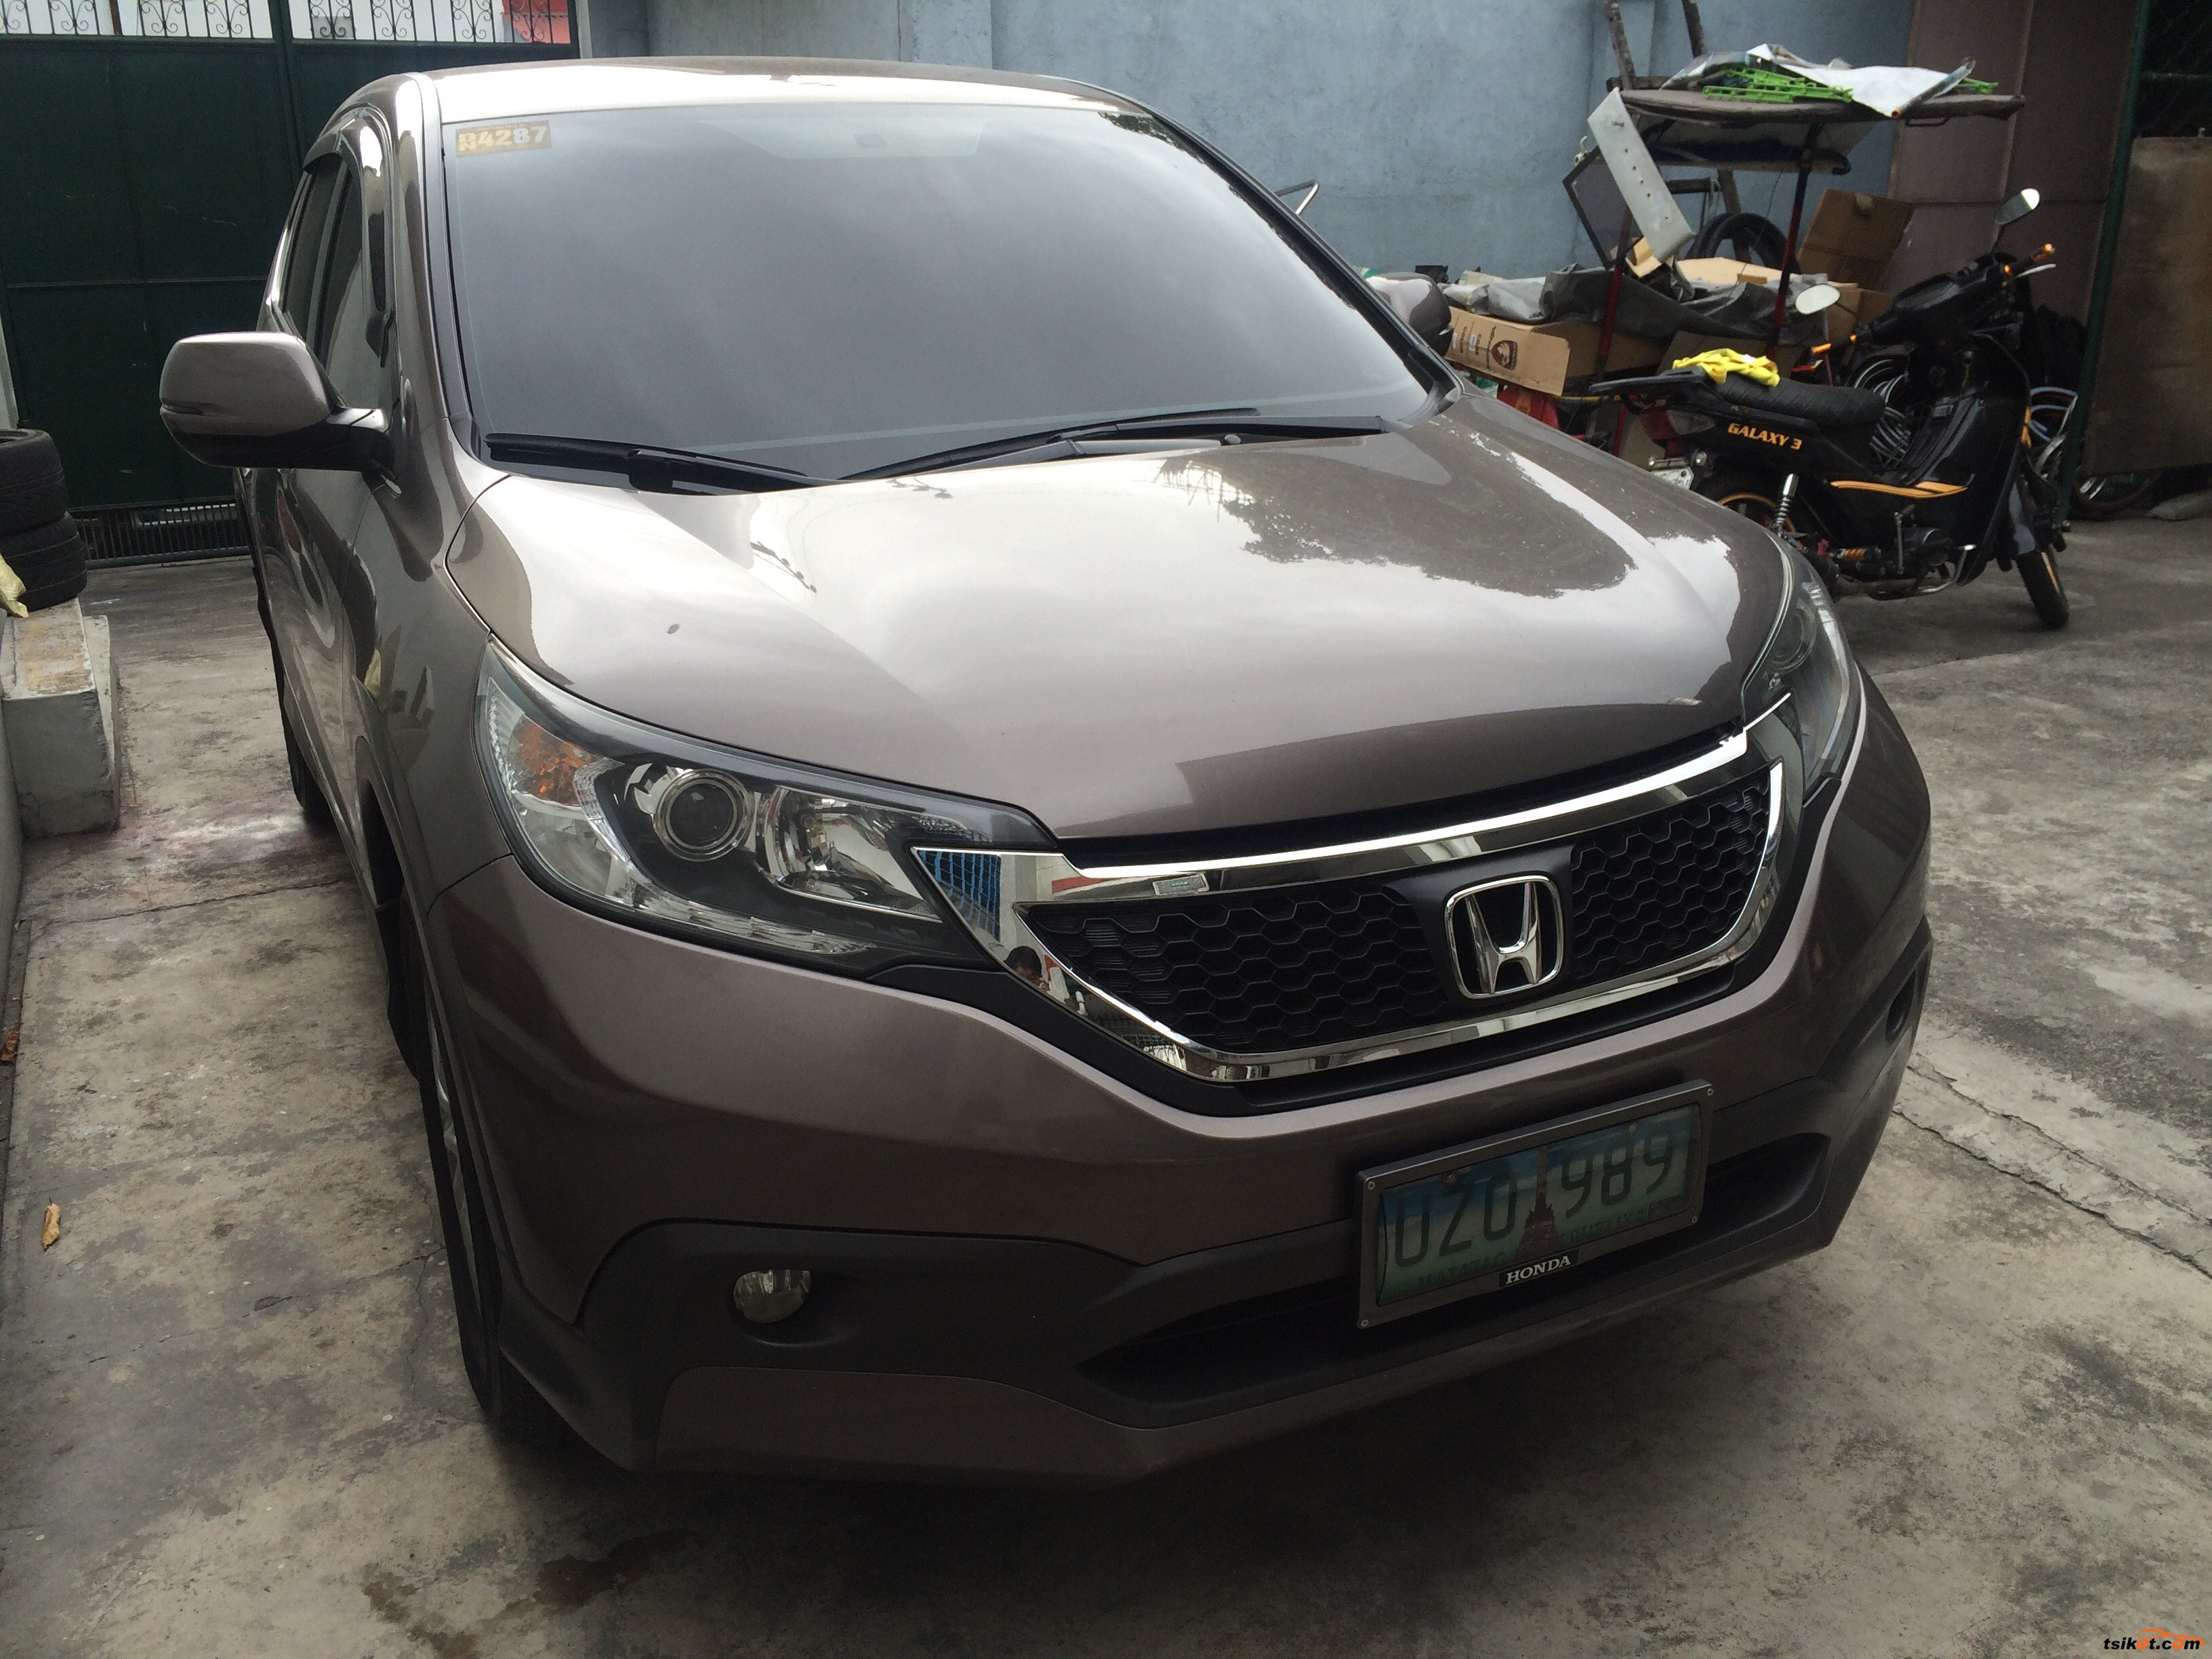 Honda Cr-V 2013 - Car for Sale Metro Manila